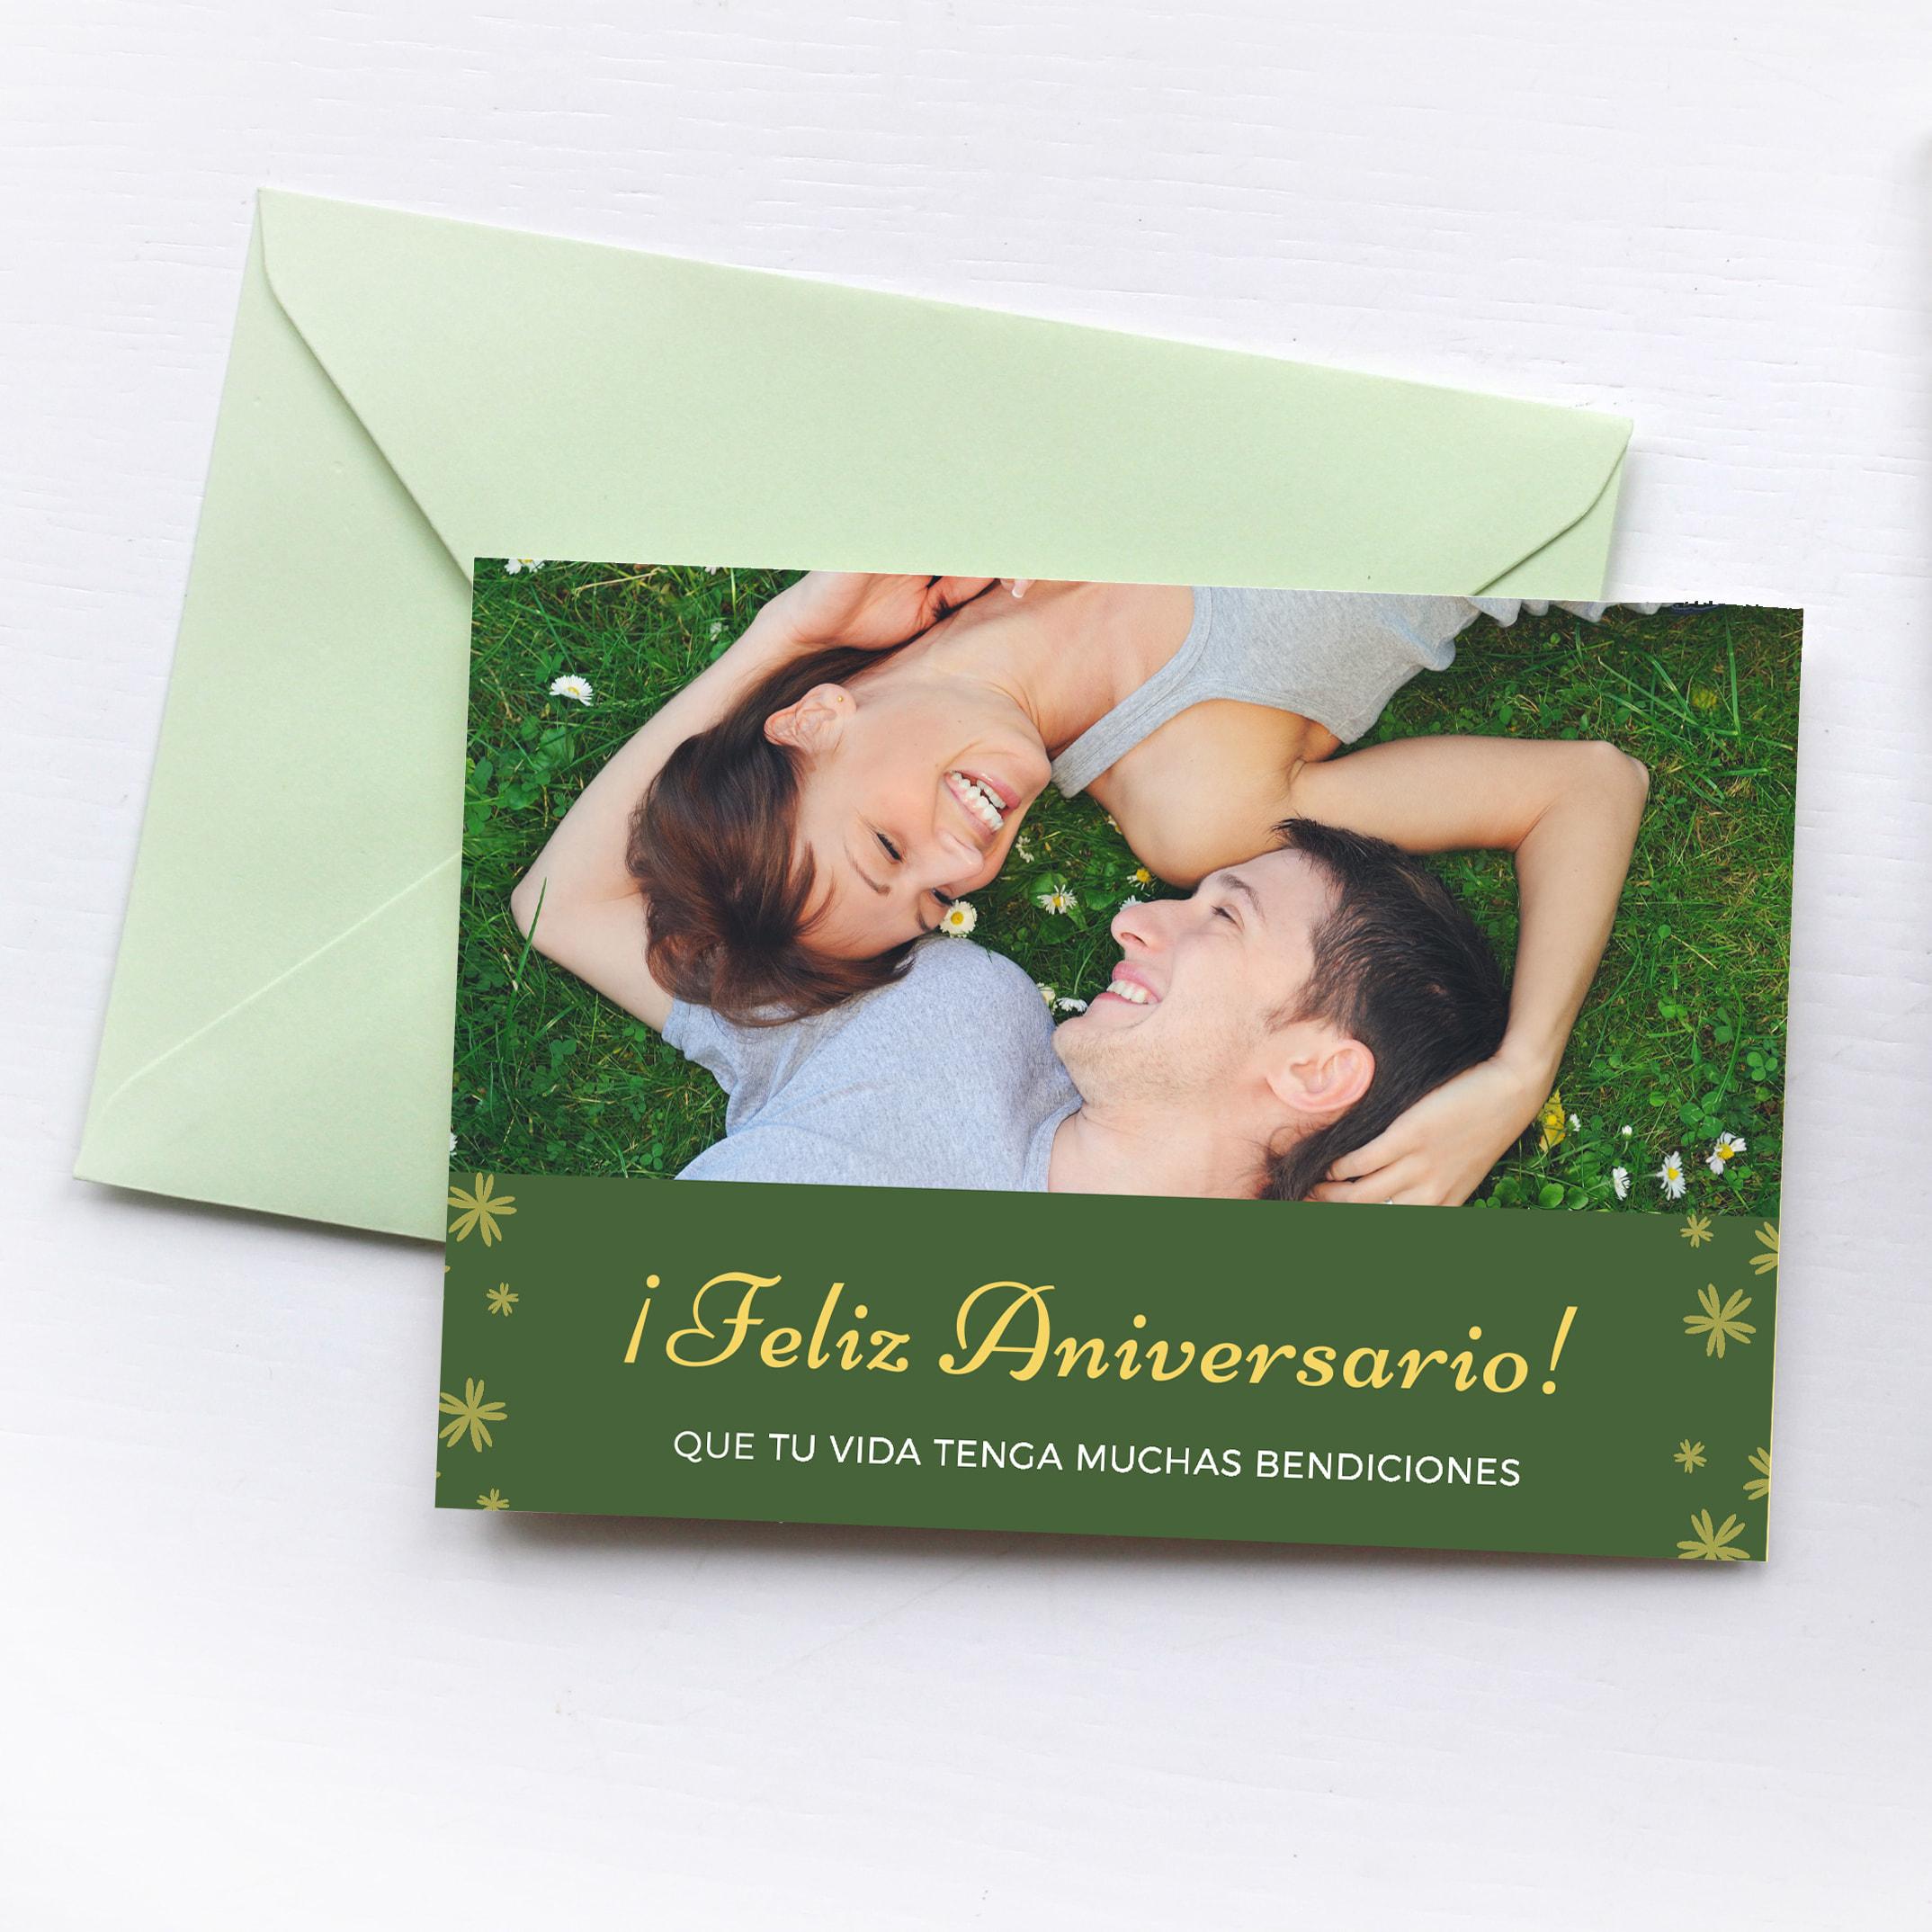 Aniversario - Green Couple Photo Anniversary Card